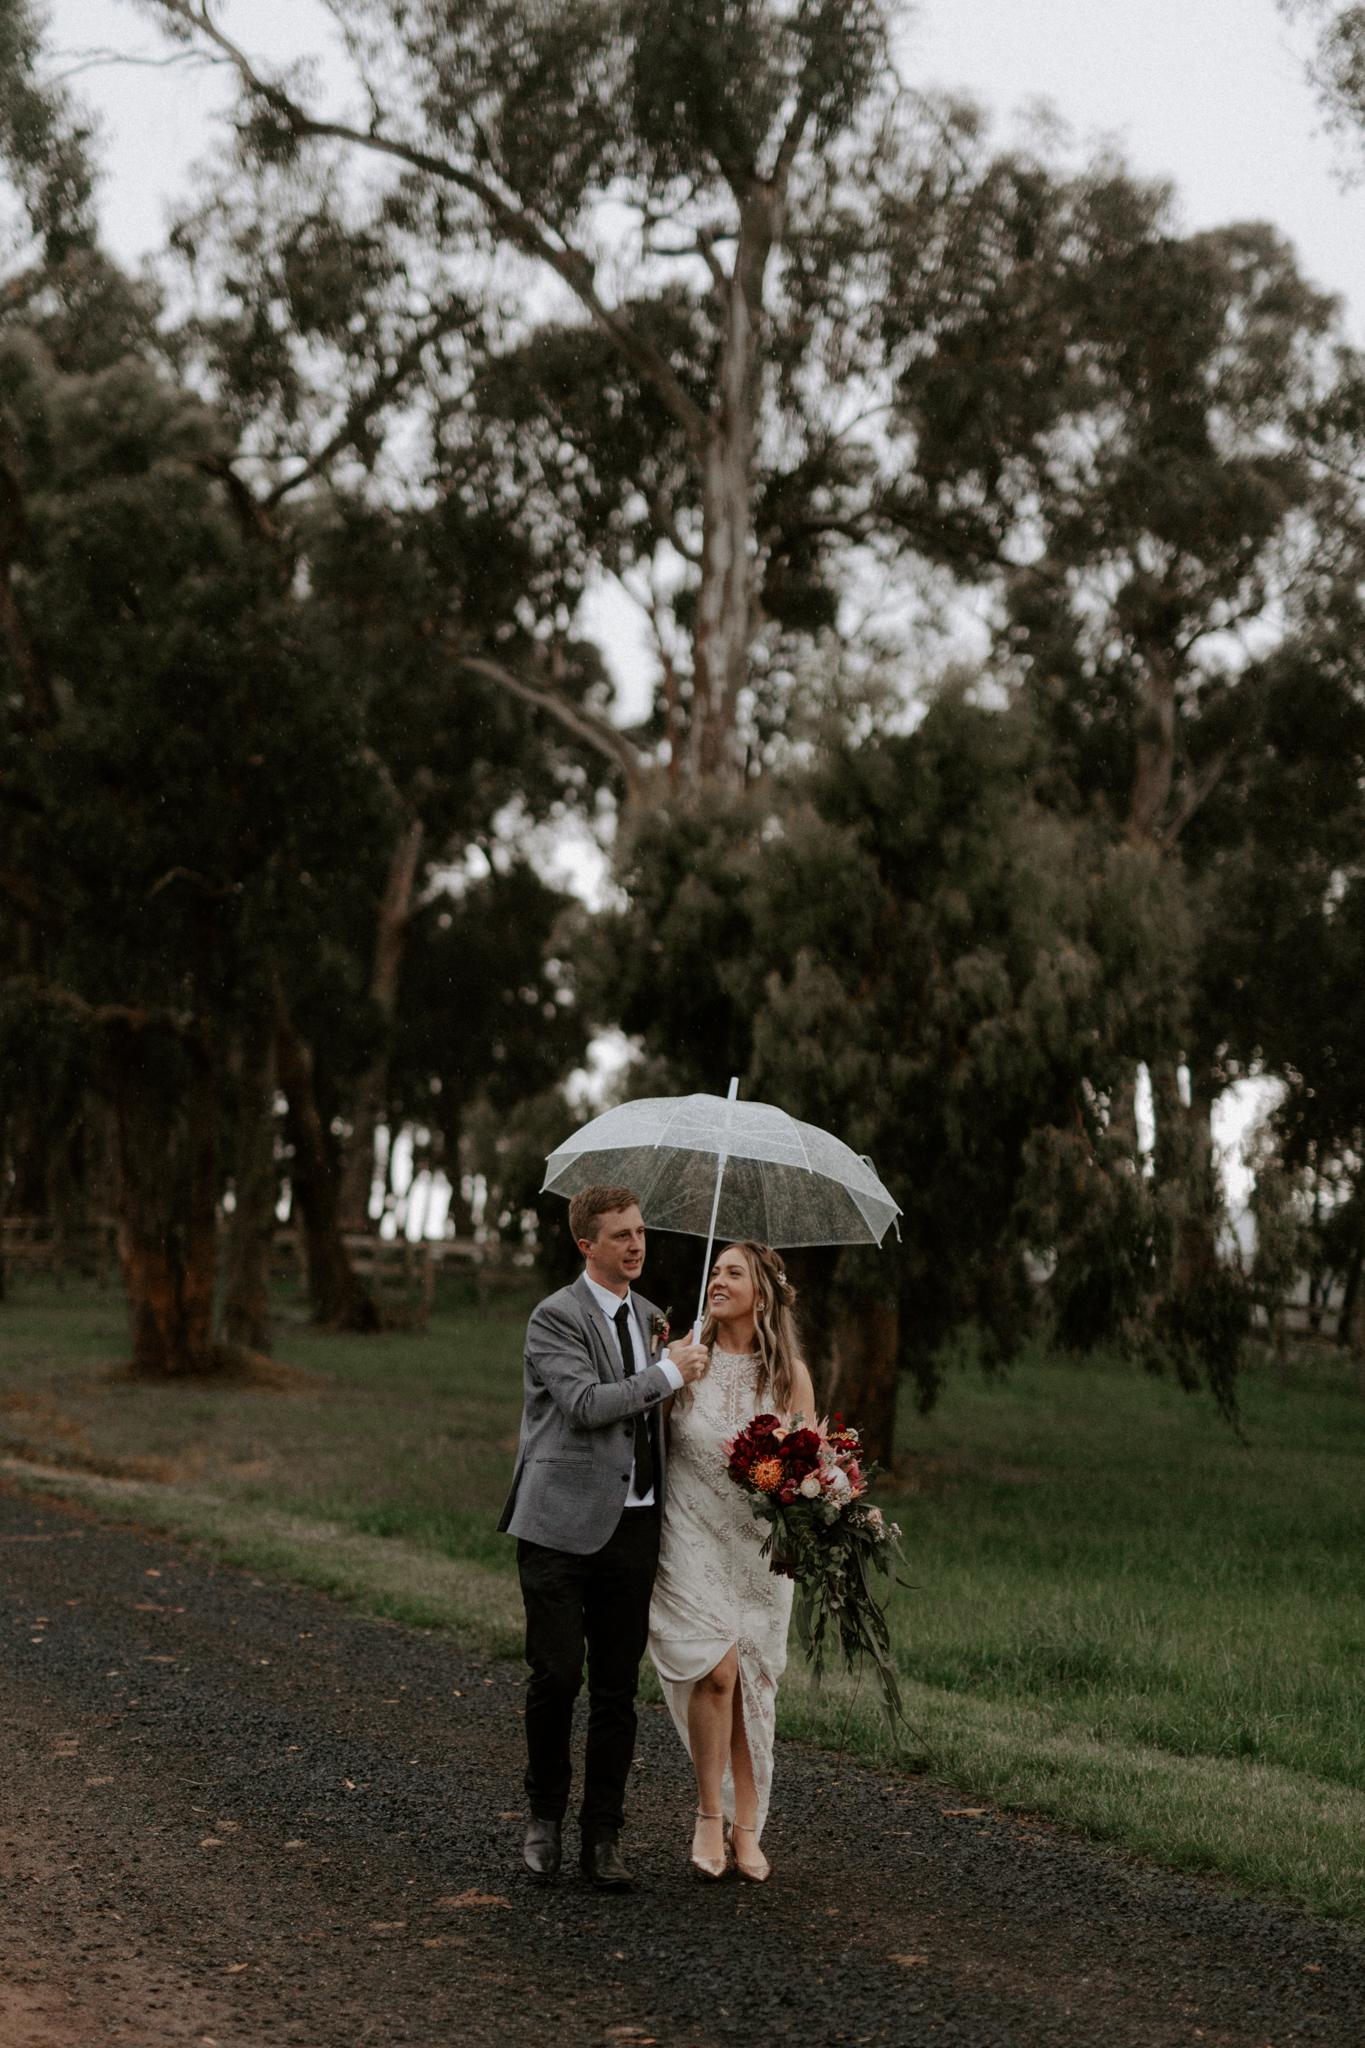 Wandin-Park-Estate-Wedding-Emotions-and-Math-Photography-081.jpg